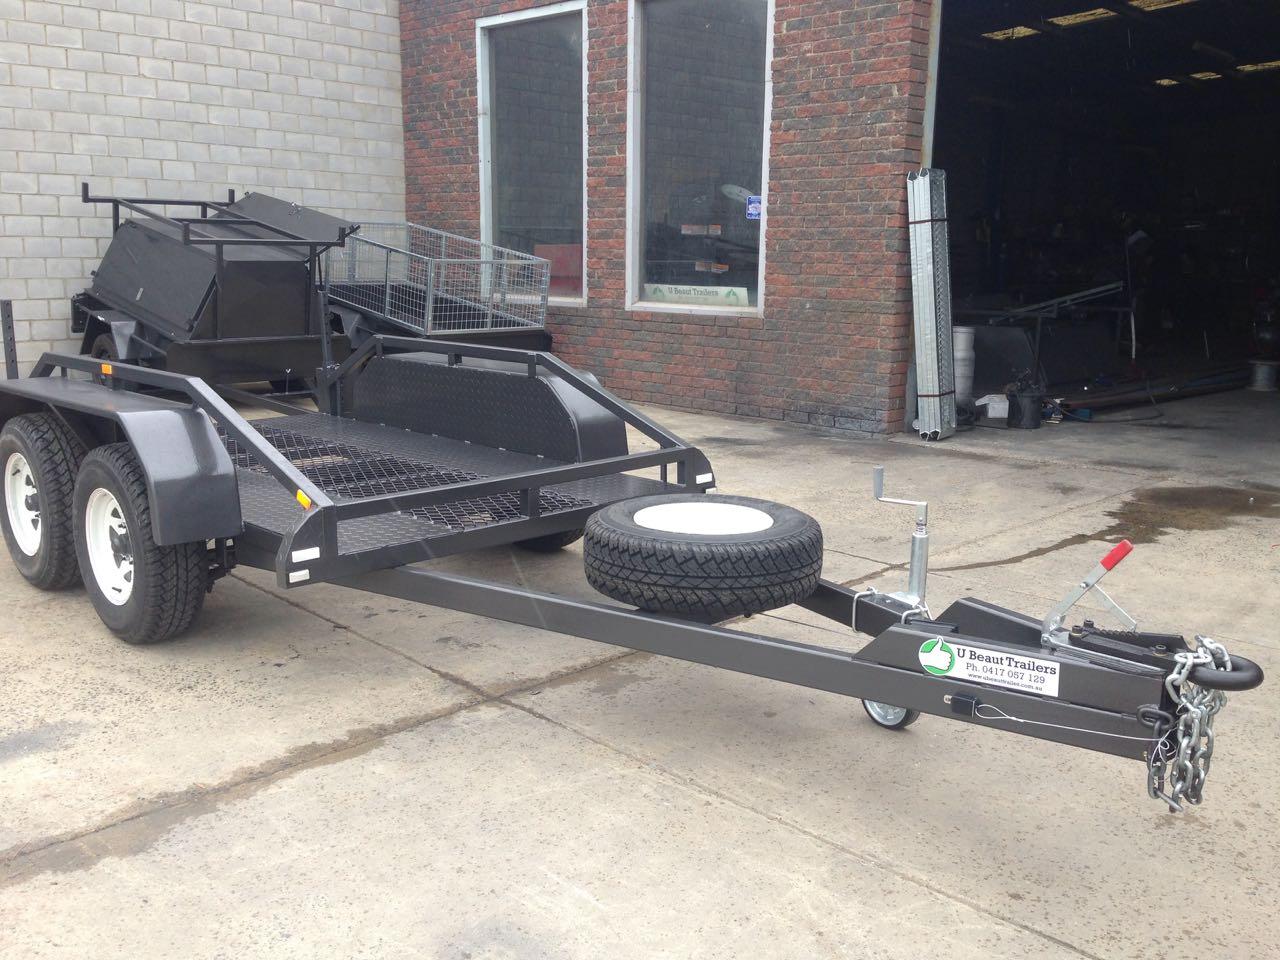 9x5 Plant trailer